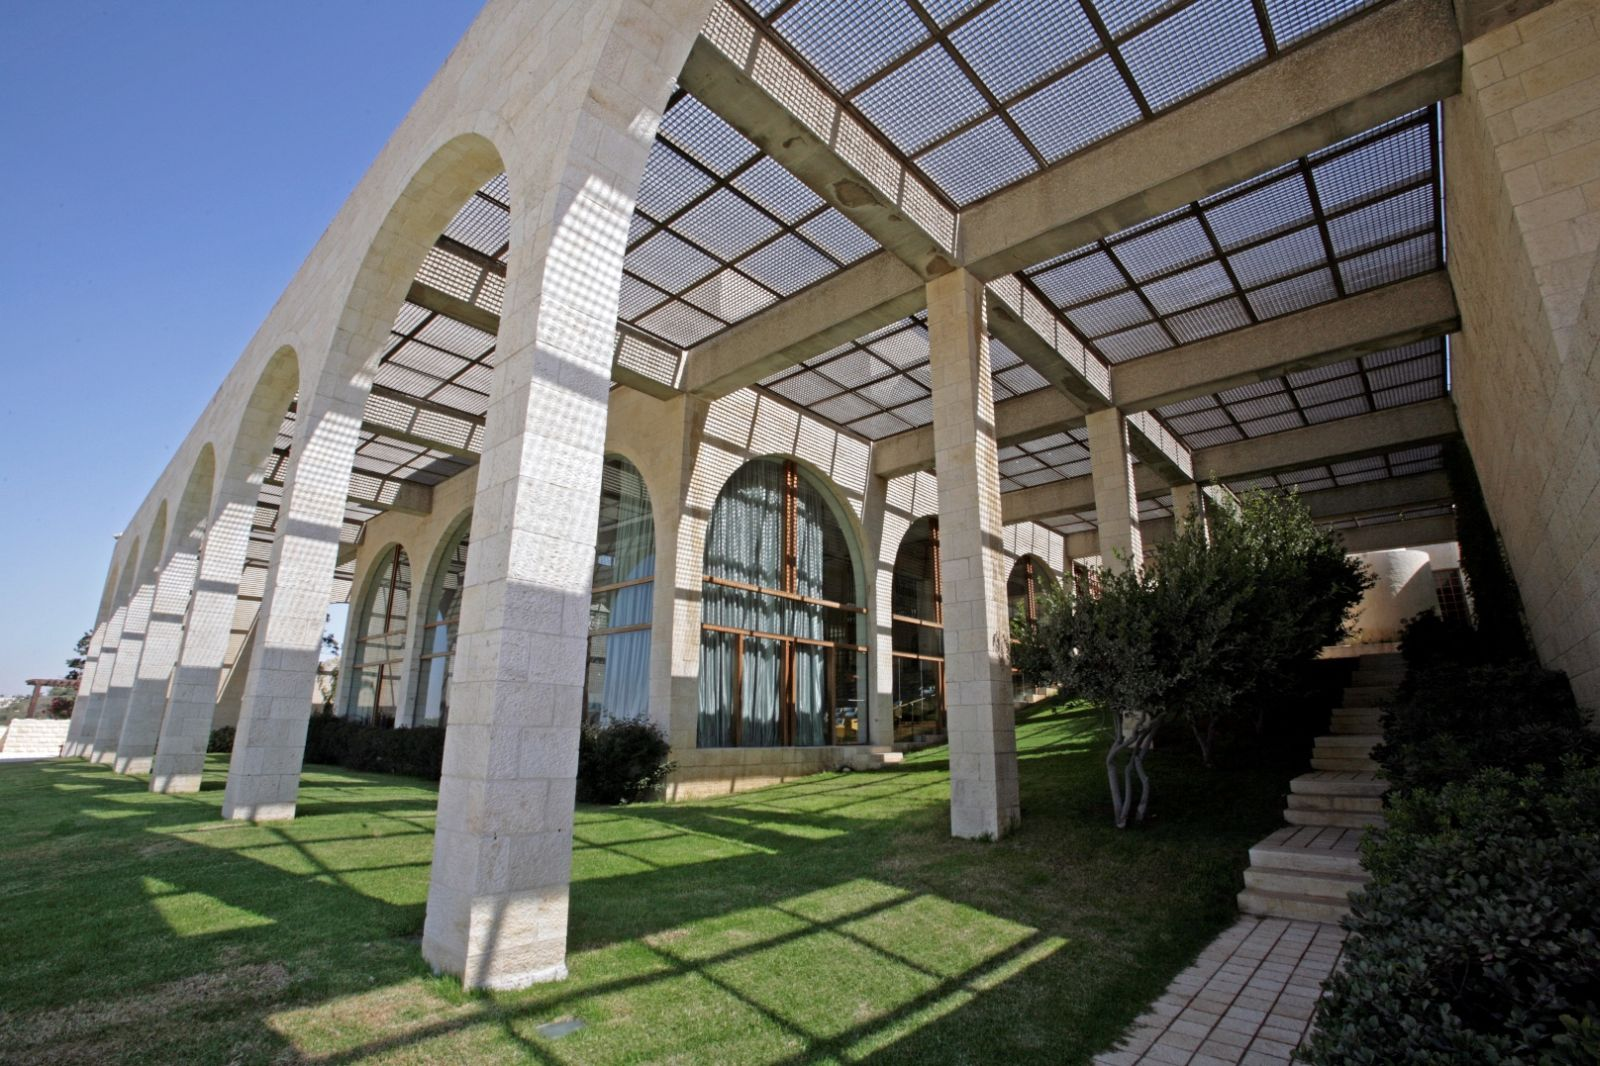 Jerusalem Center for Near Eastern Studies. Photo by Natan Dvir